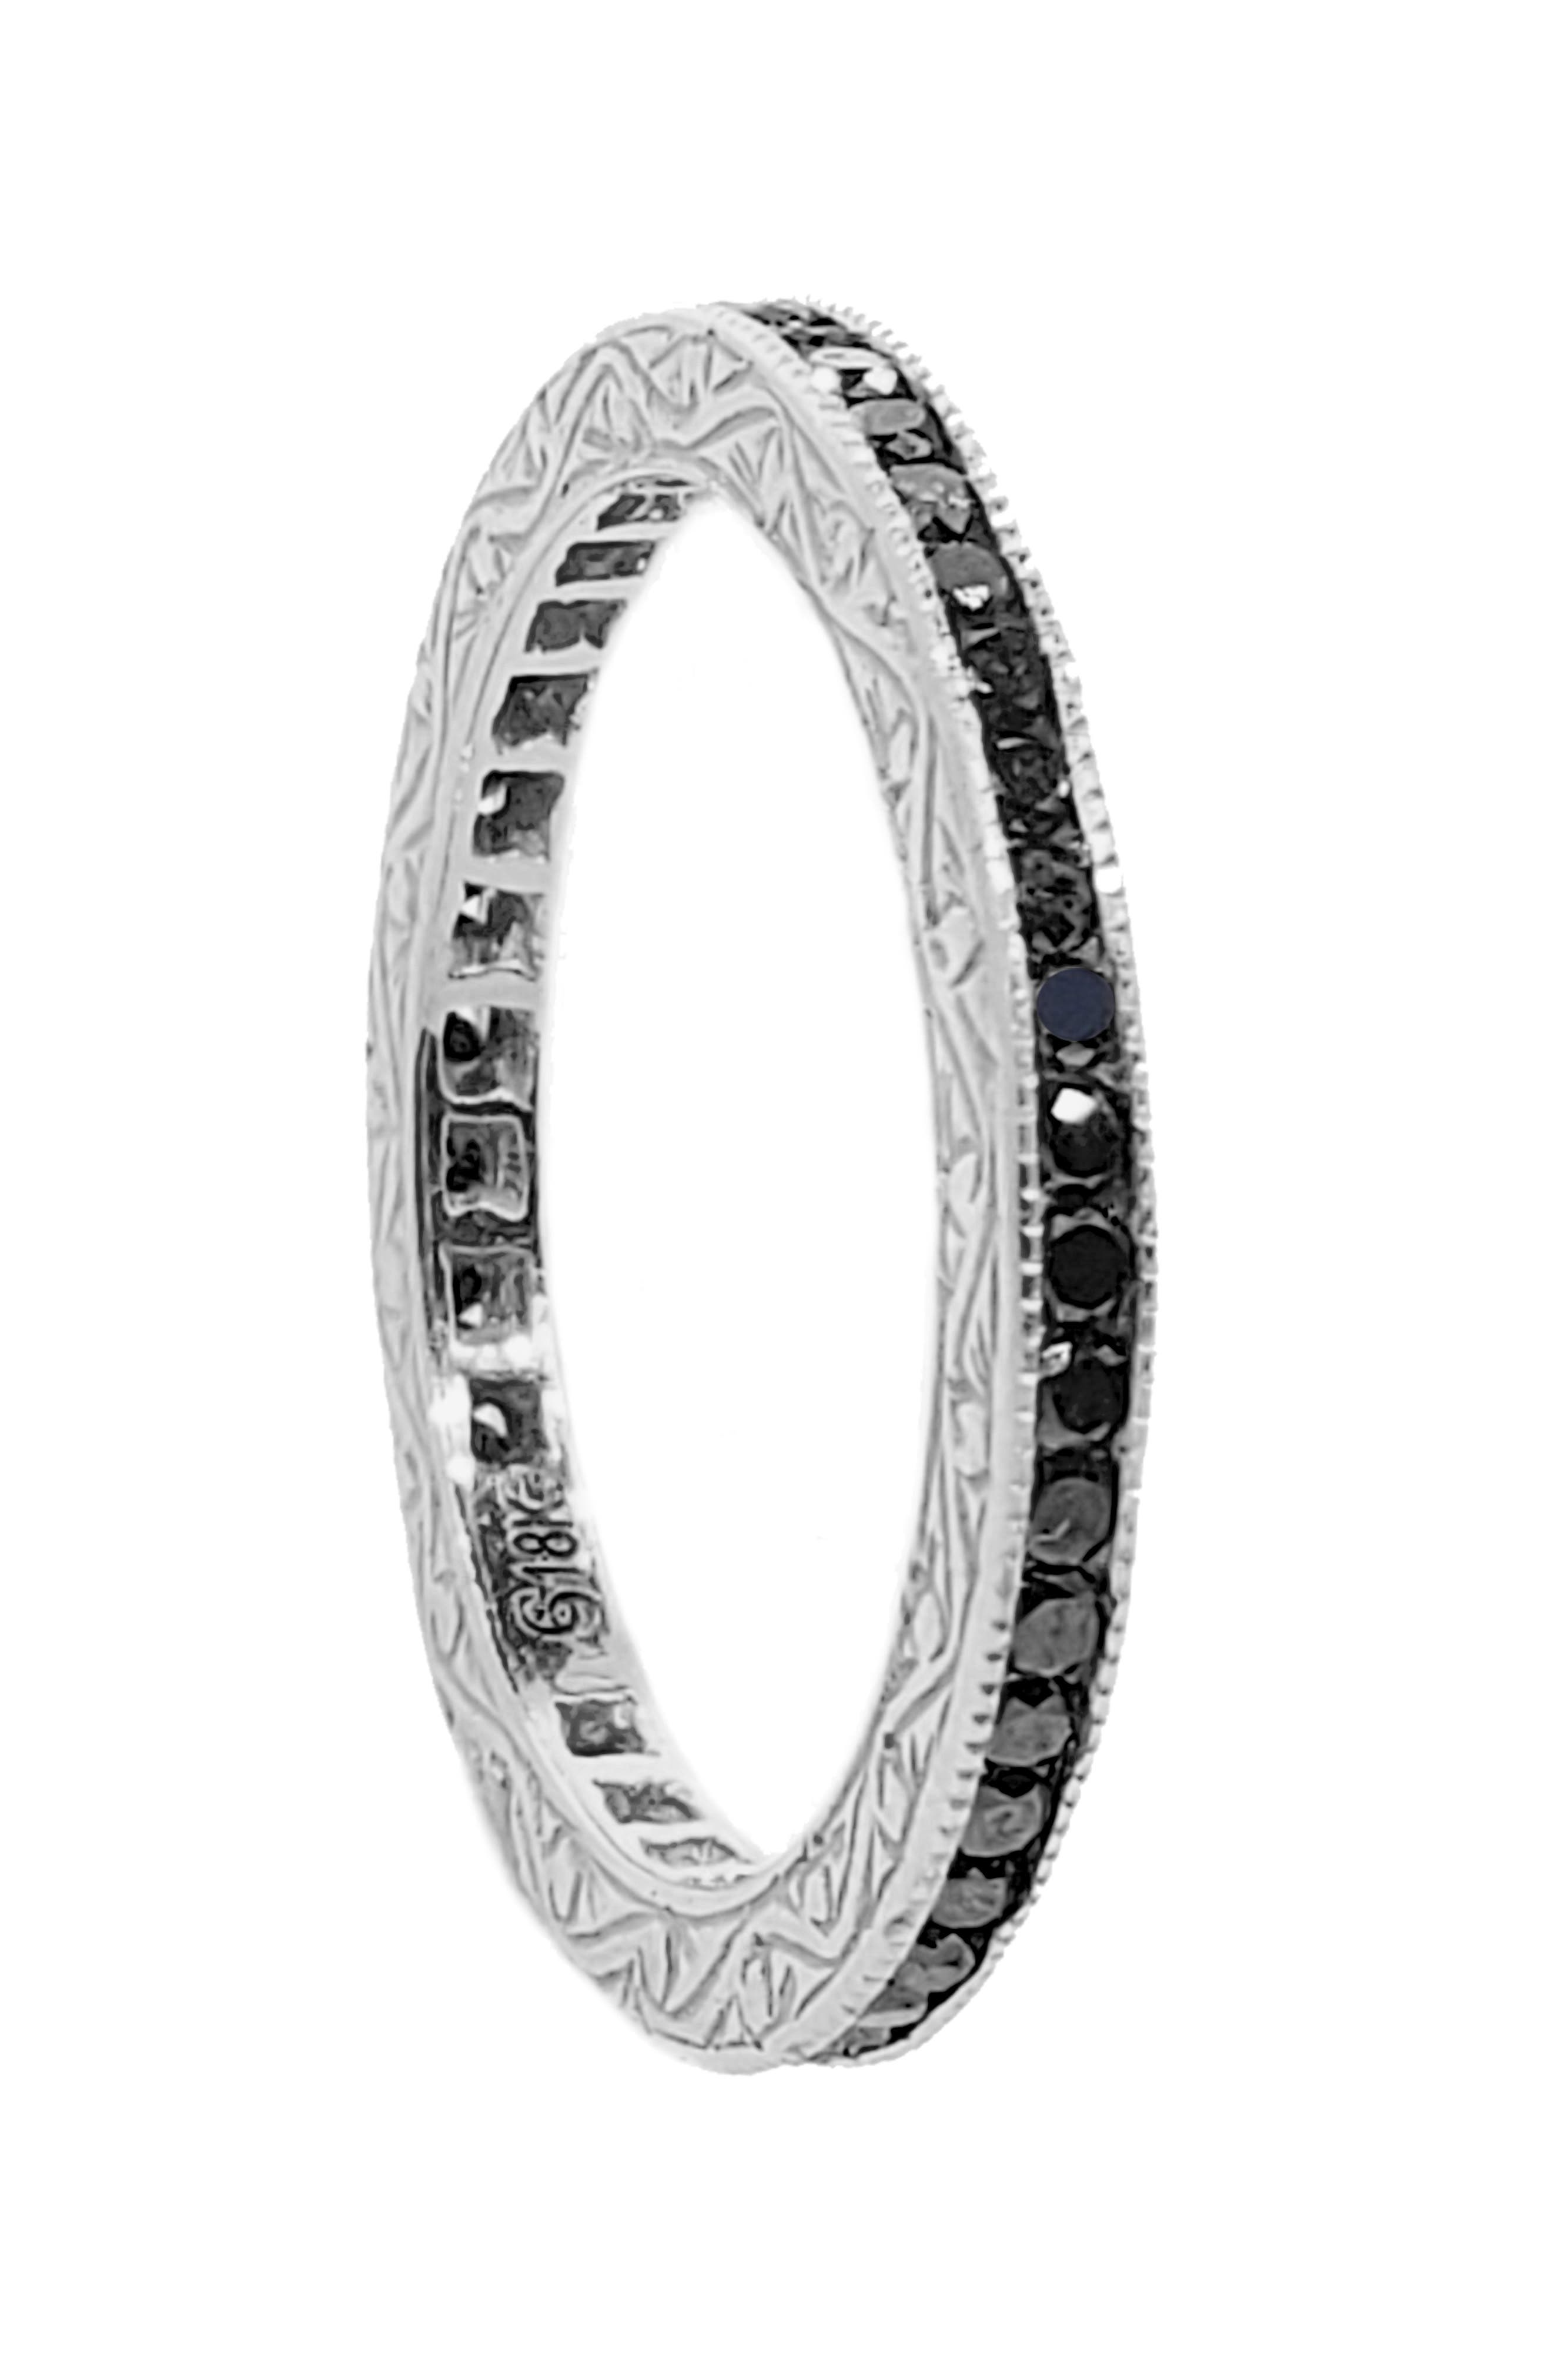 Channel Set Diamond Ring,                         Main,                         color, White Gold/ Black Diamond